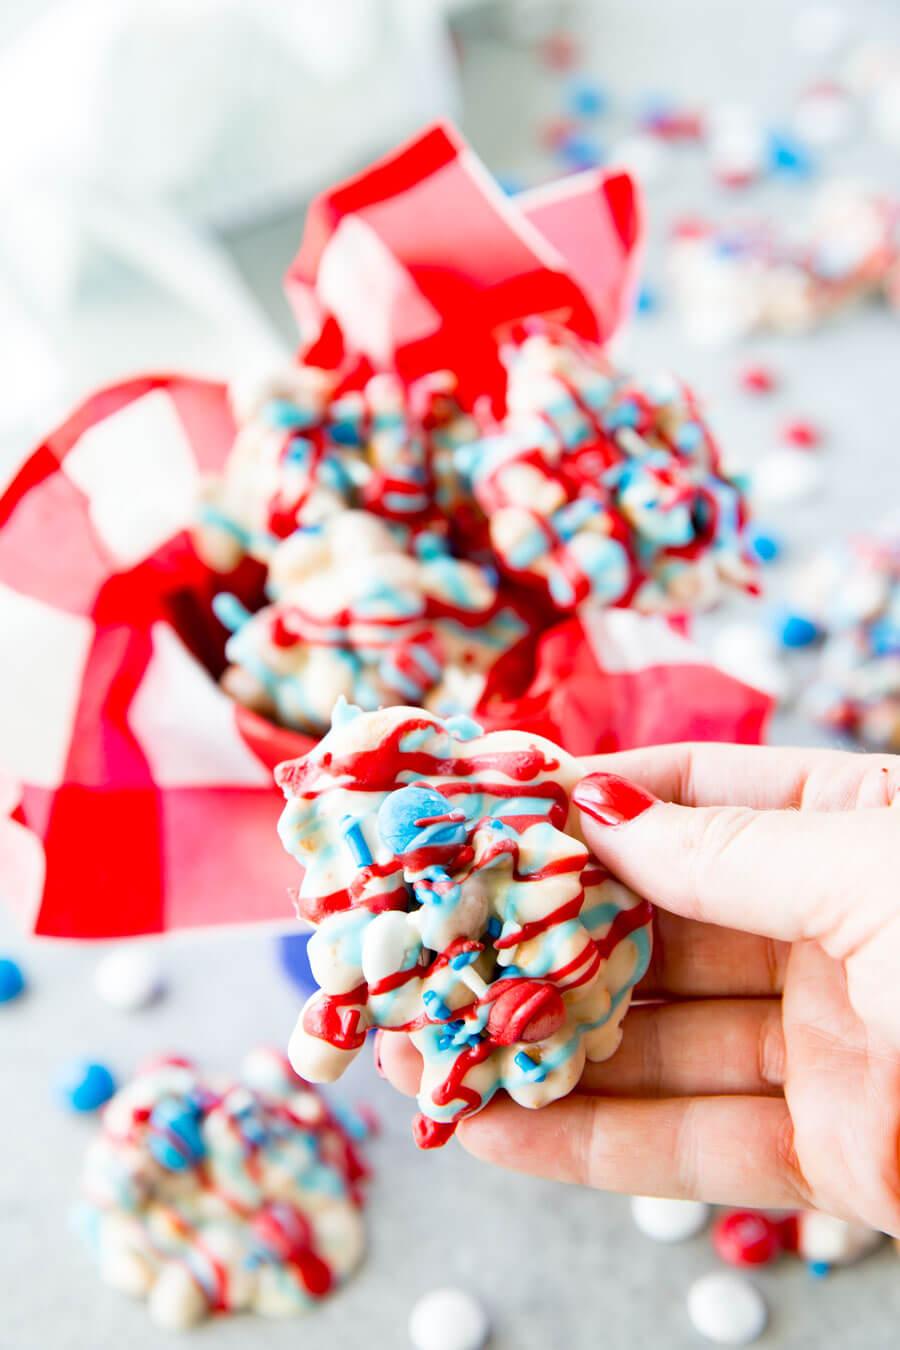 Crock Pot Candy: Peanut Clusters made festive